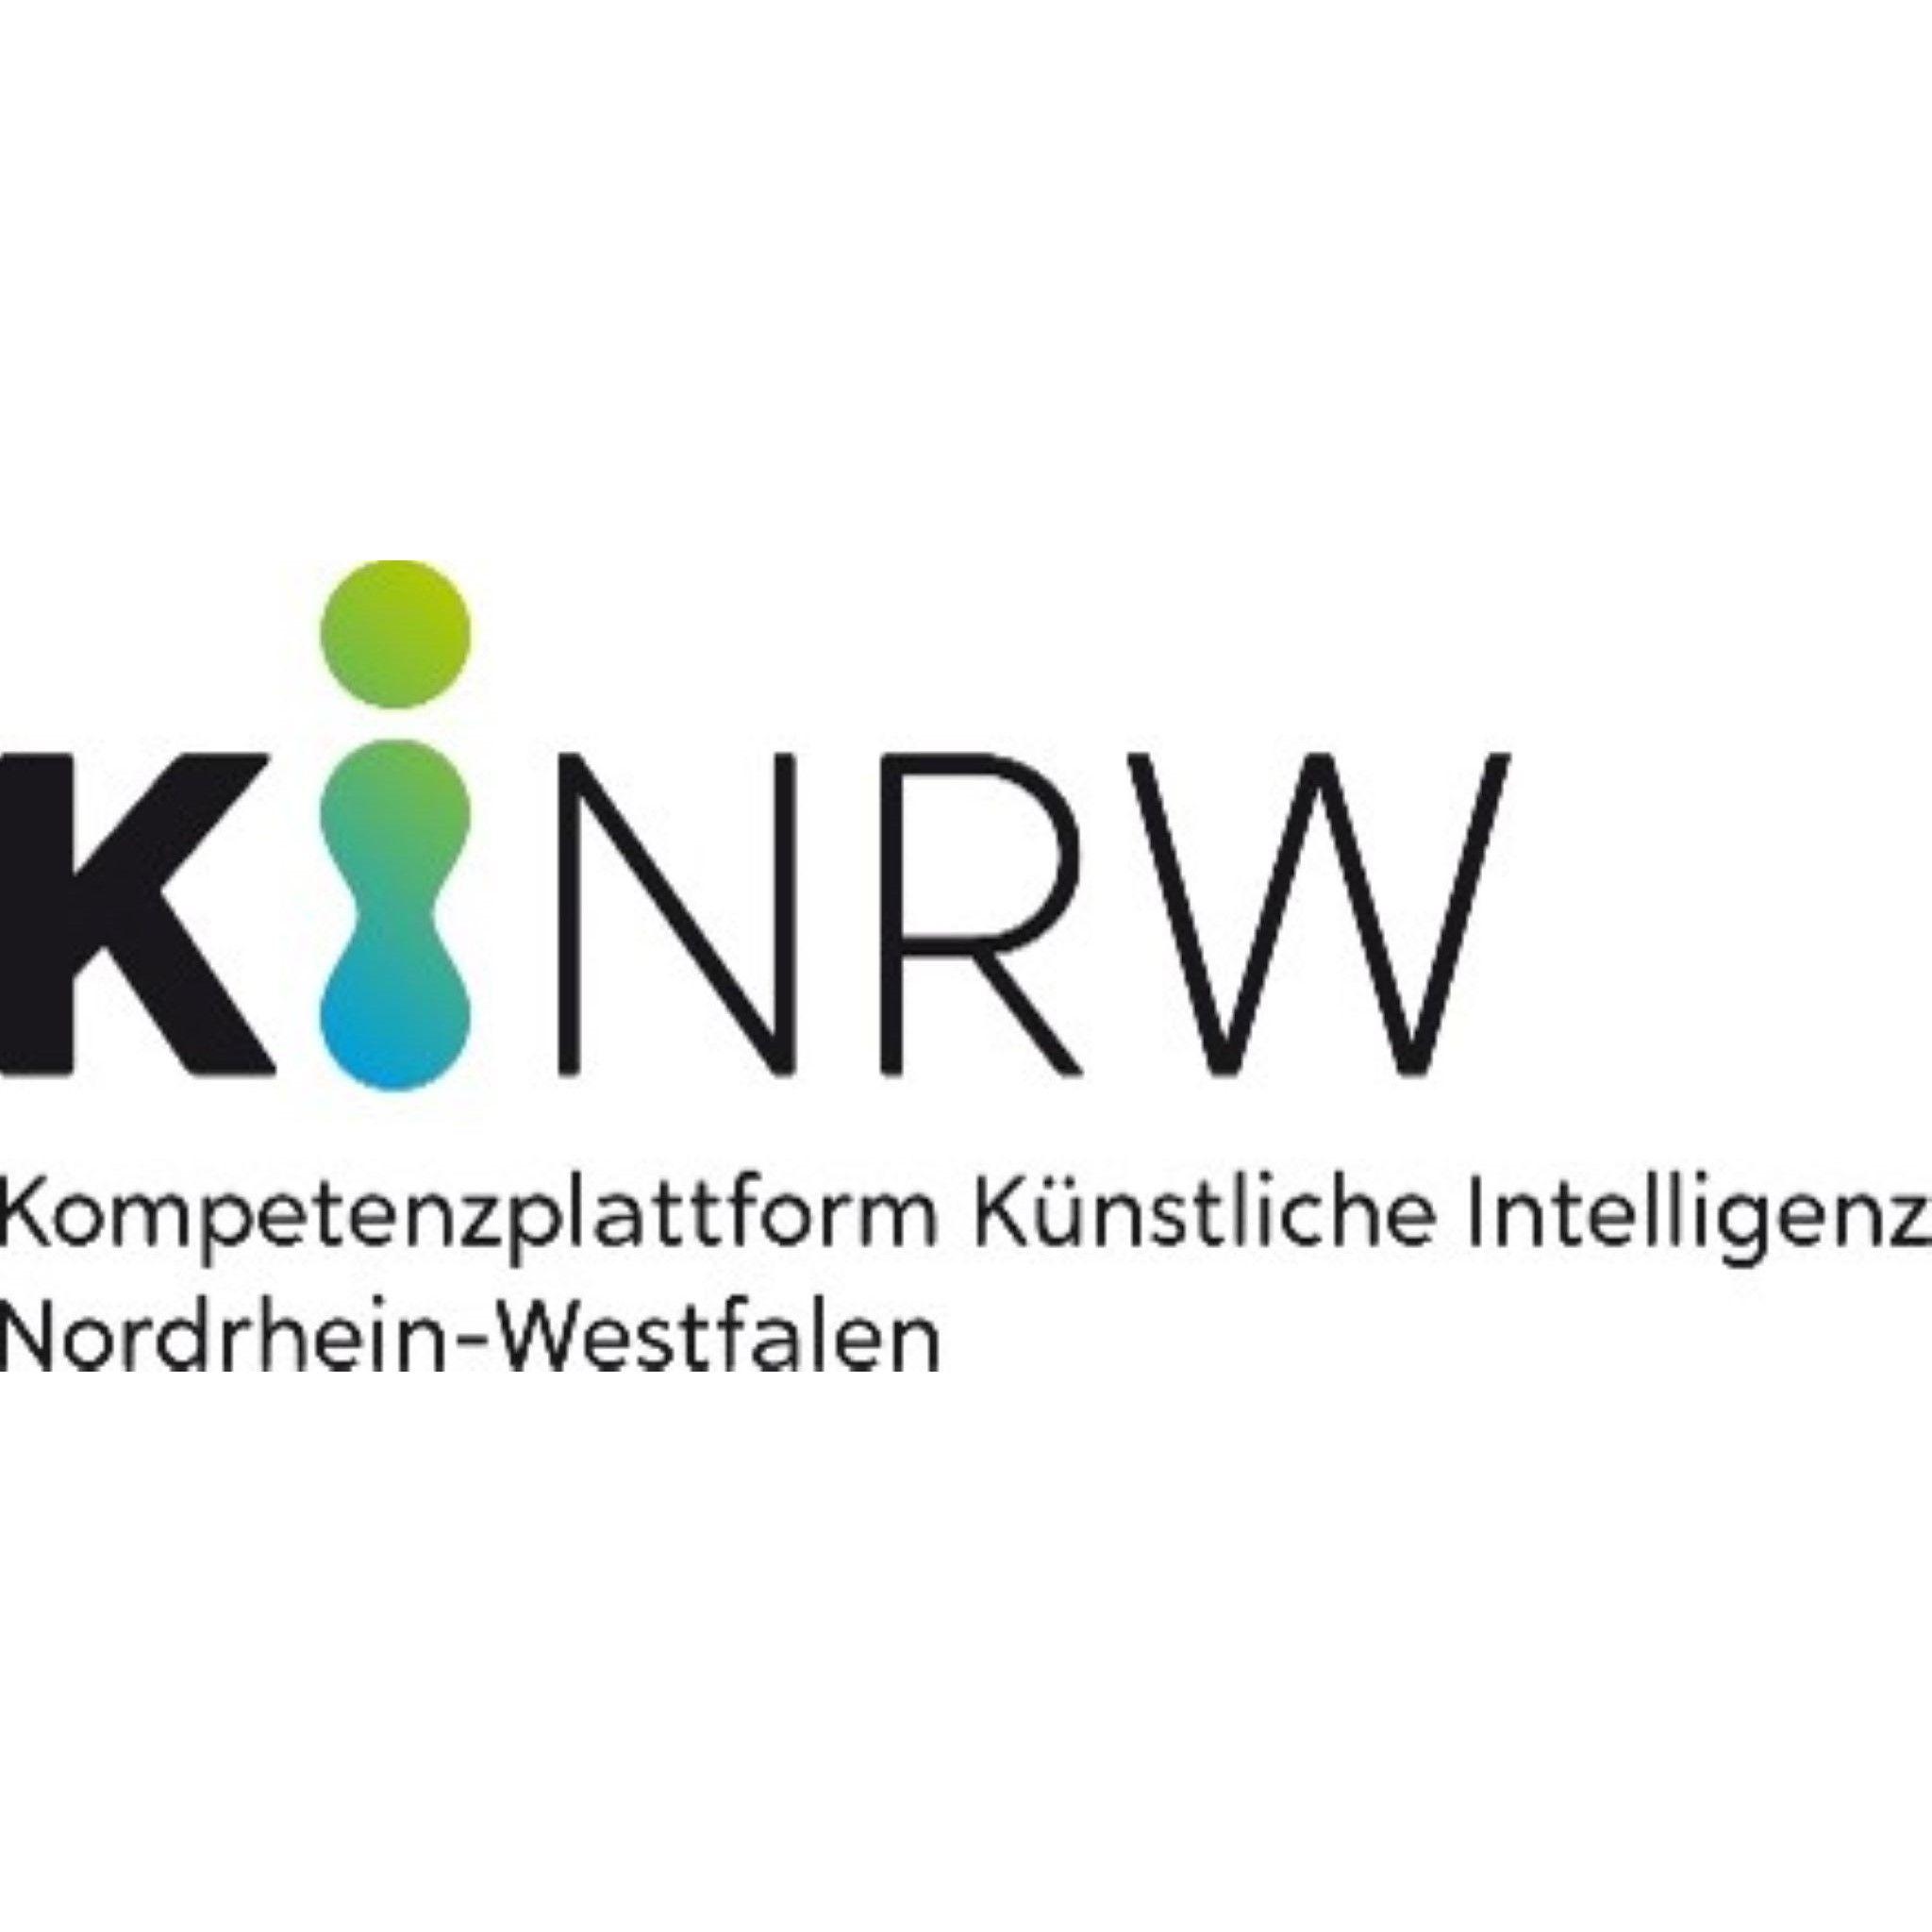 KI.NRW Artificial Intelligence Competence Platform